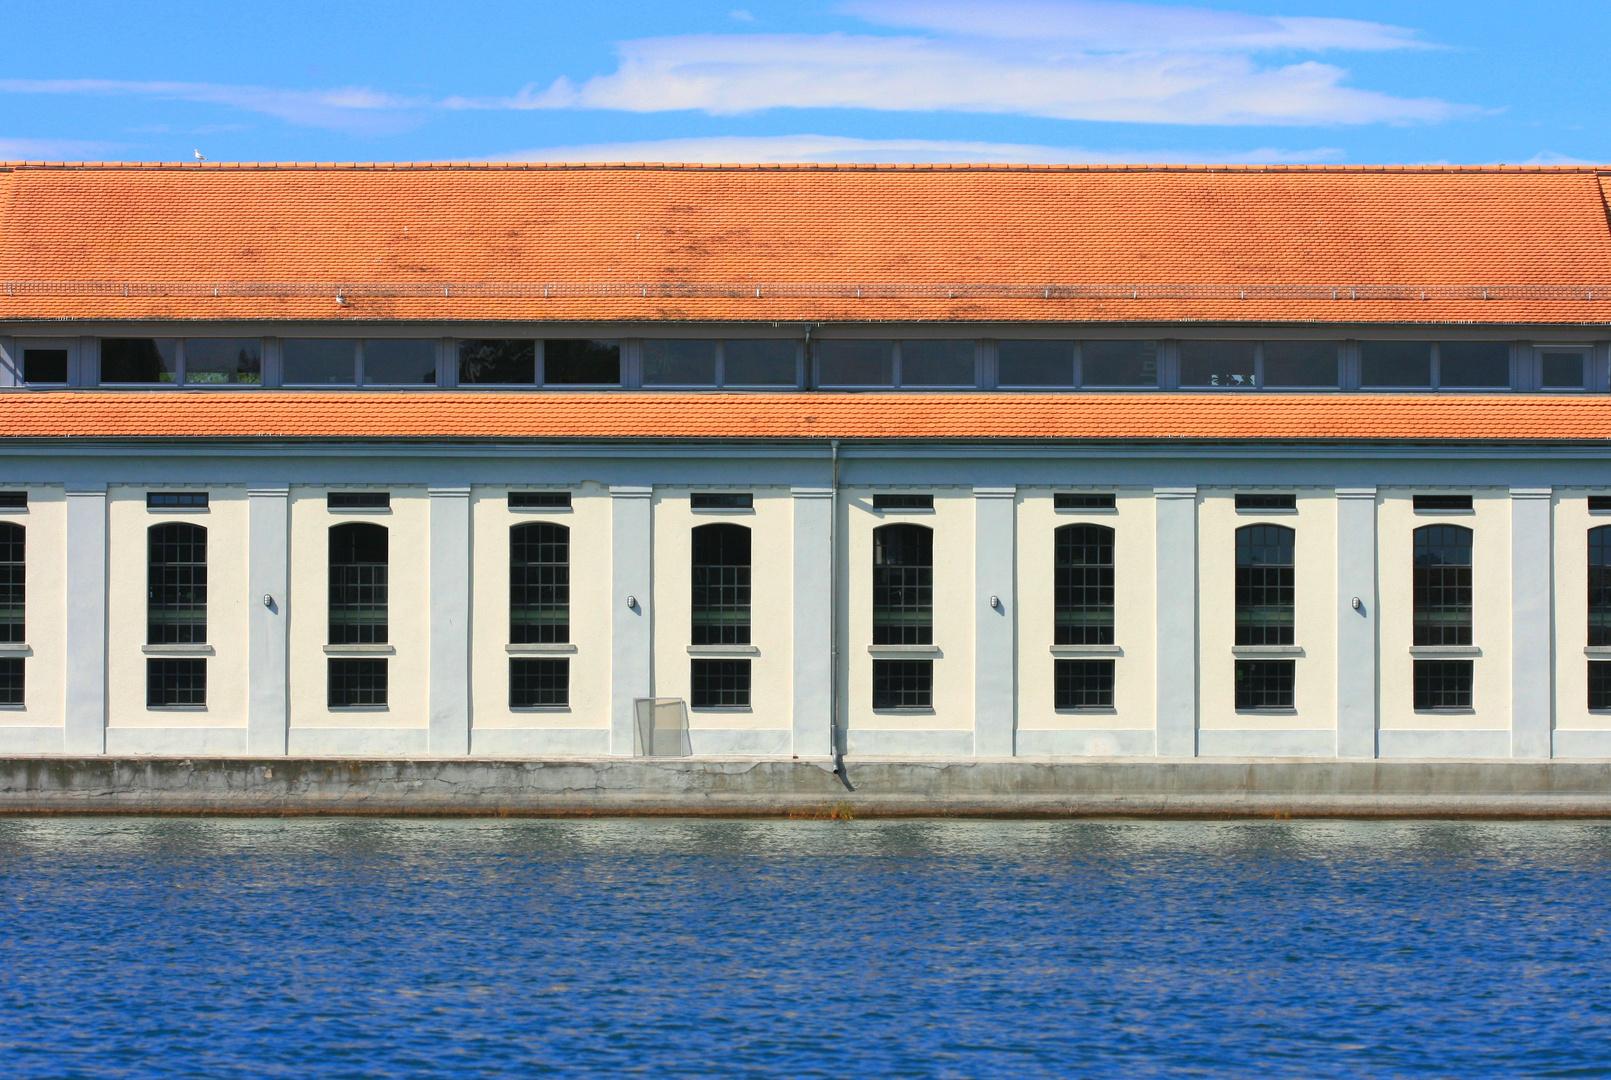 Wasserfront a